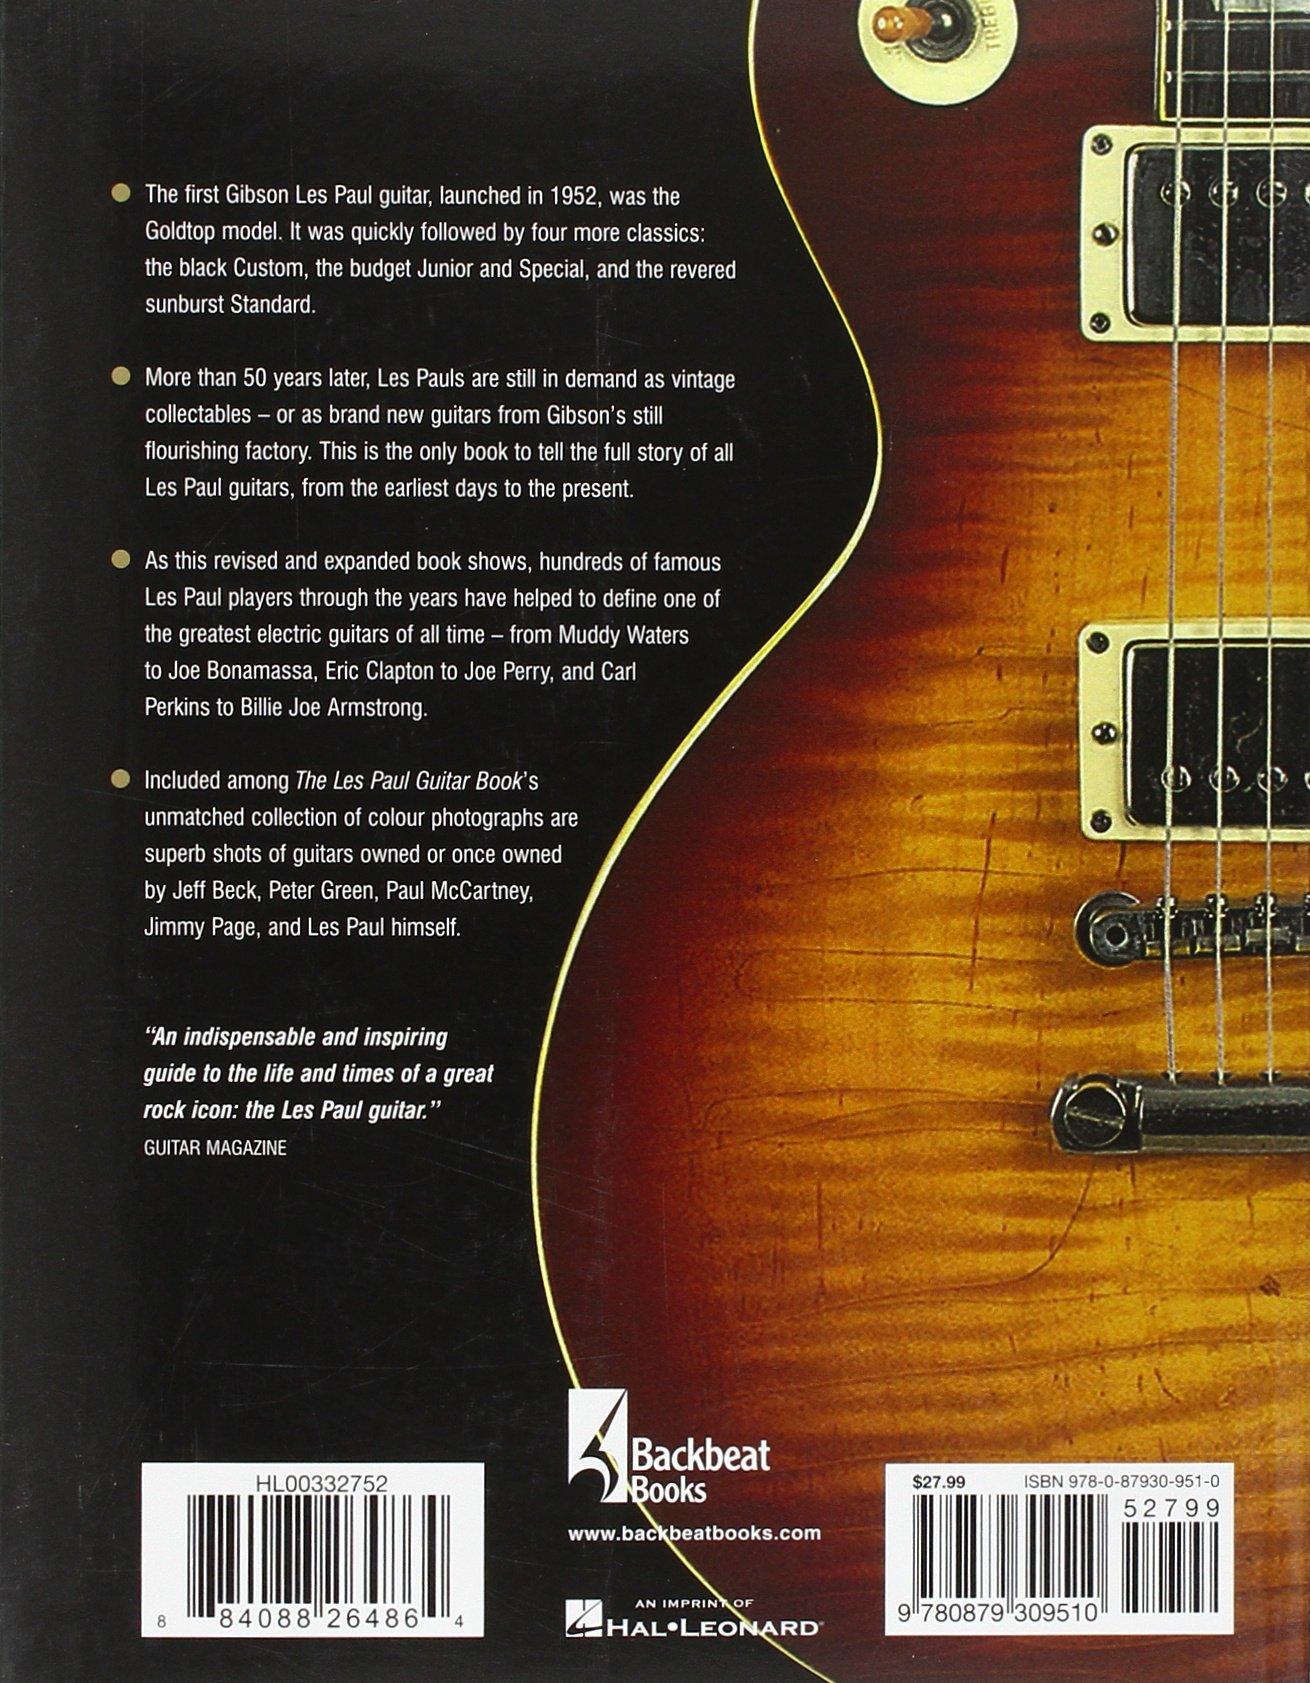 the les paul guitar book a plete history of gibson les paul